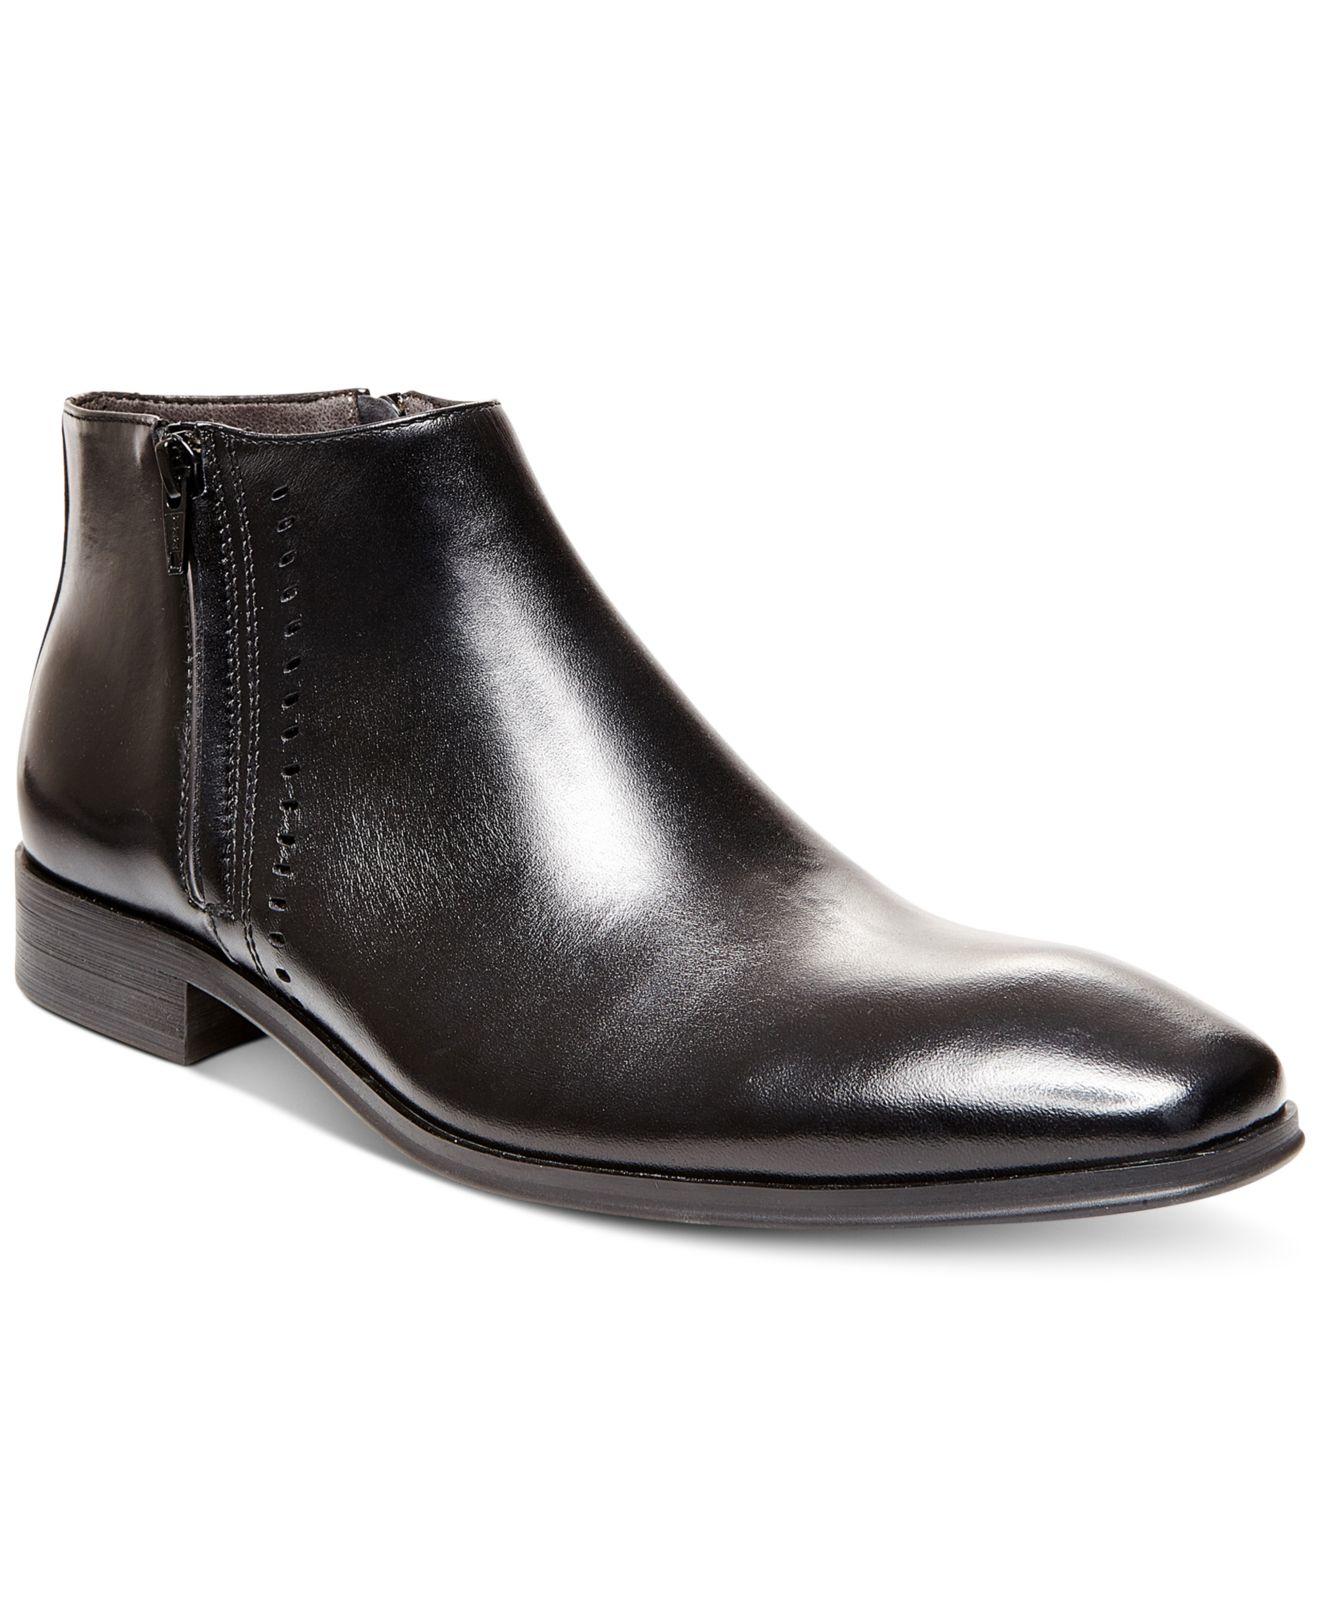 f4e9680eb2a Lyst - Steve Madden Felcore Dress Boots in Black for Men